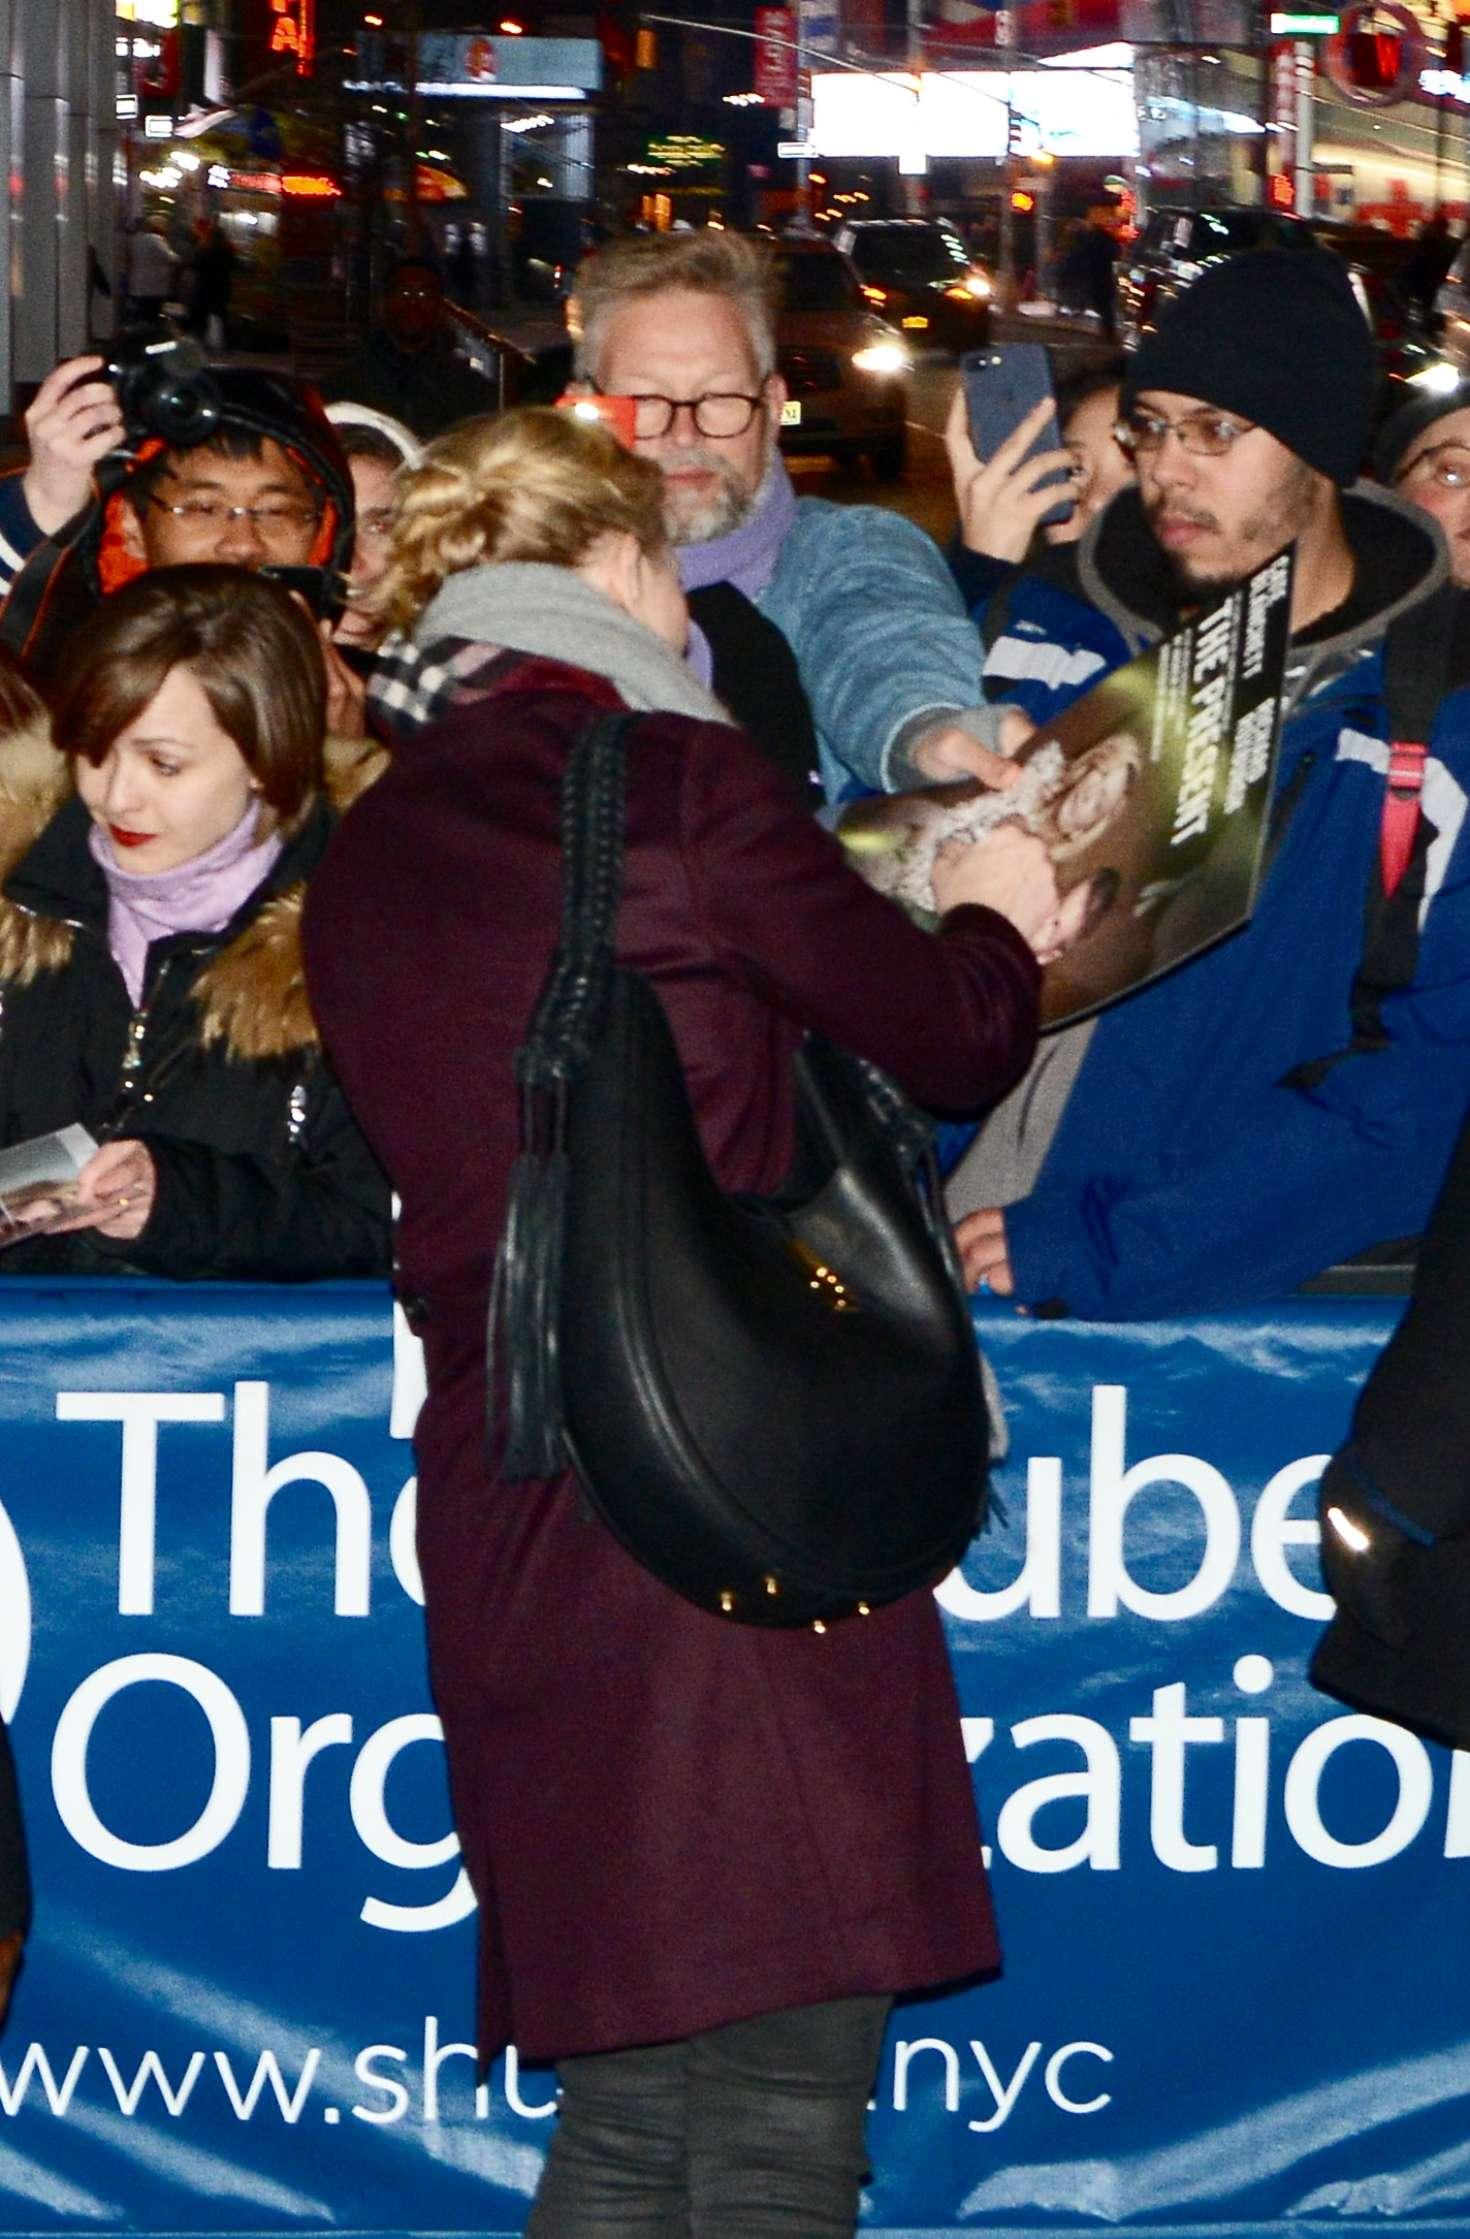 Cate Blanchett 2017 : Cate Blanchett: Meets fans after her broadway performance -03